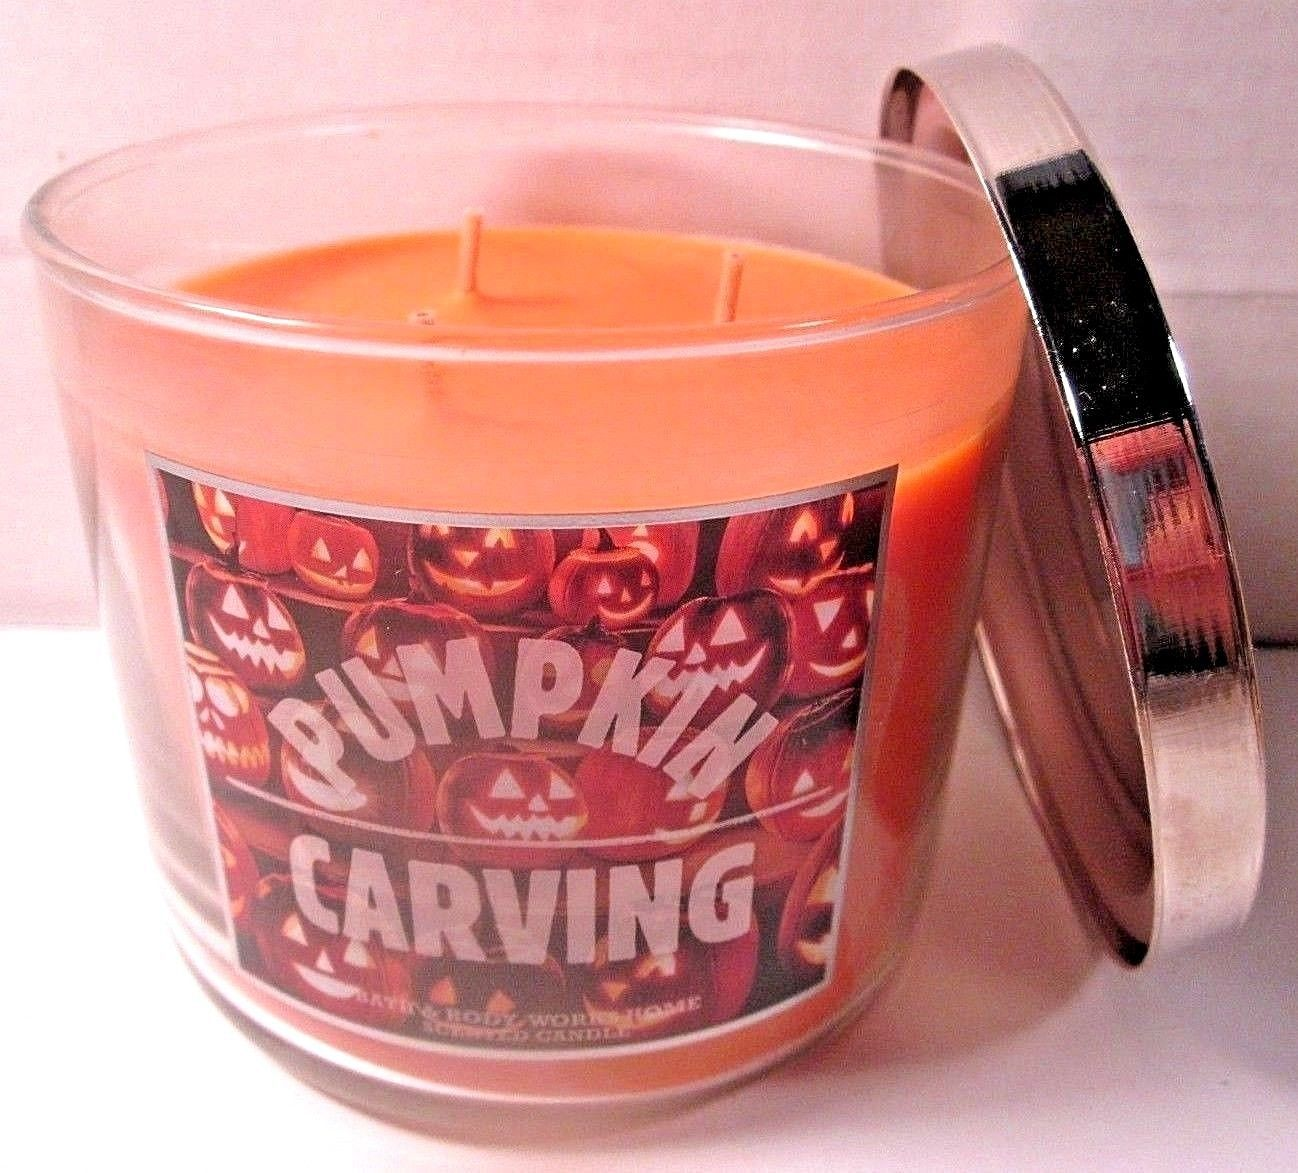 Bath & Body Works 3 wick 14.5 oz Candle jack-o-lanterns  Pumpkin Carving image 2